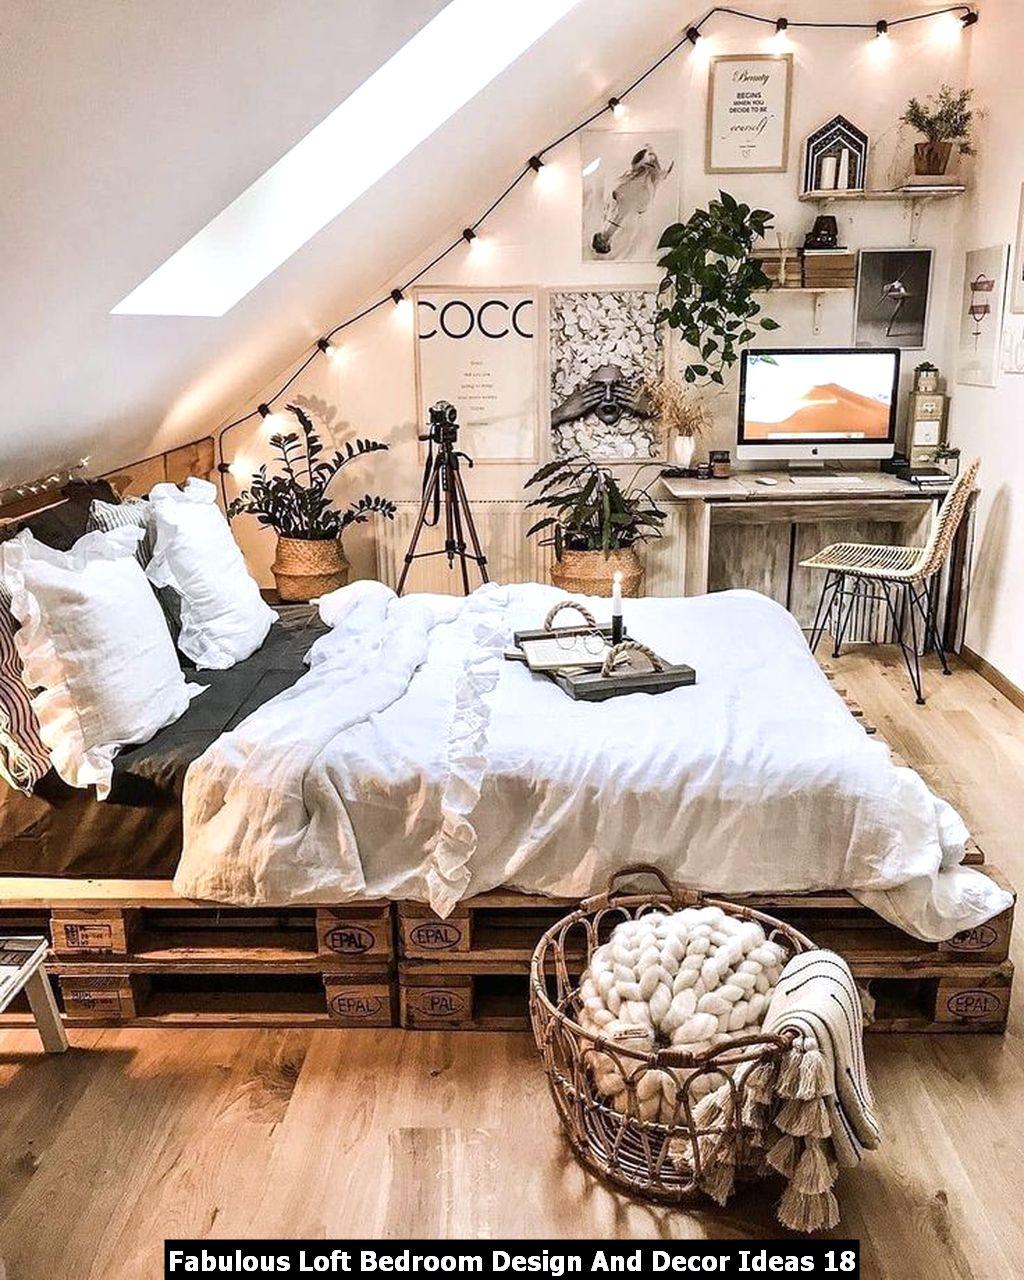 Fabulous Loft Bedroom Design And Decor Ideas 18